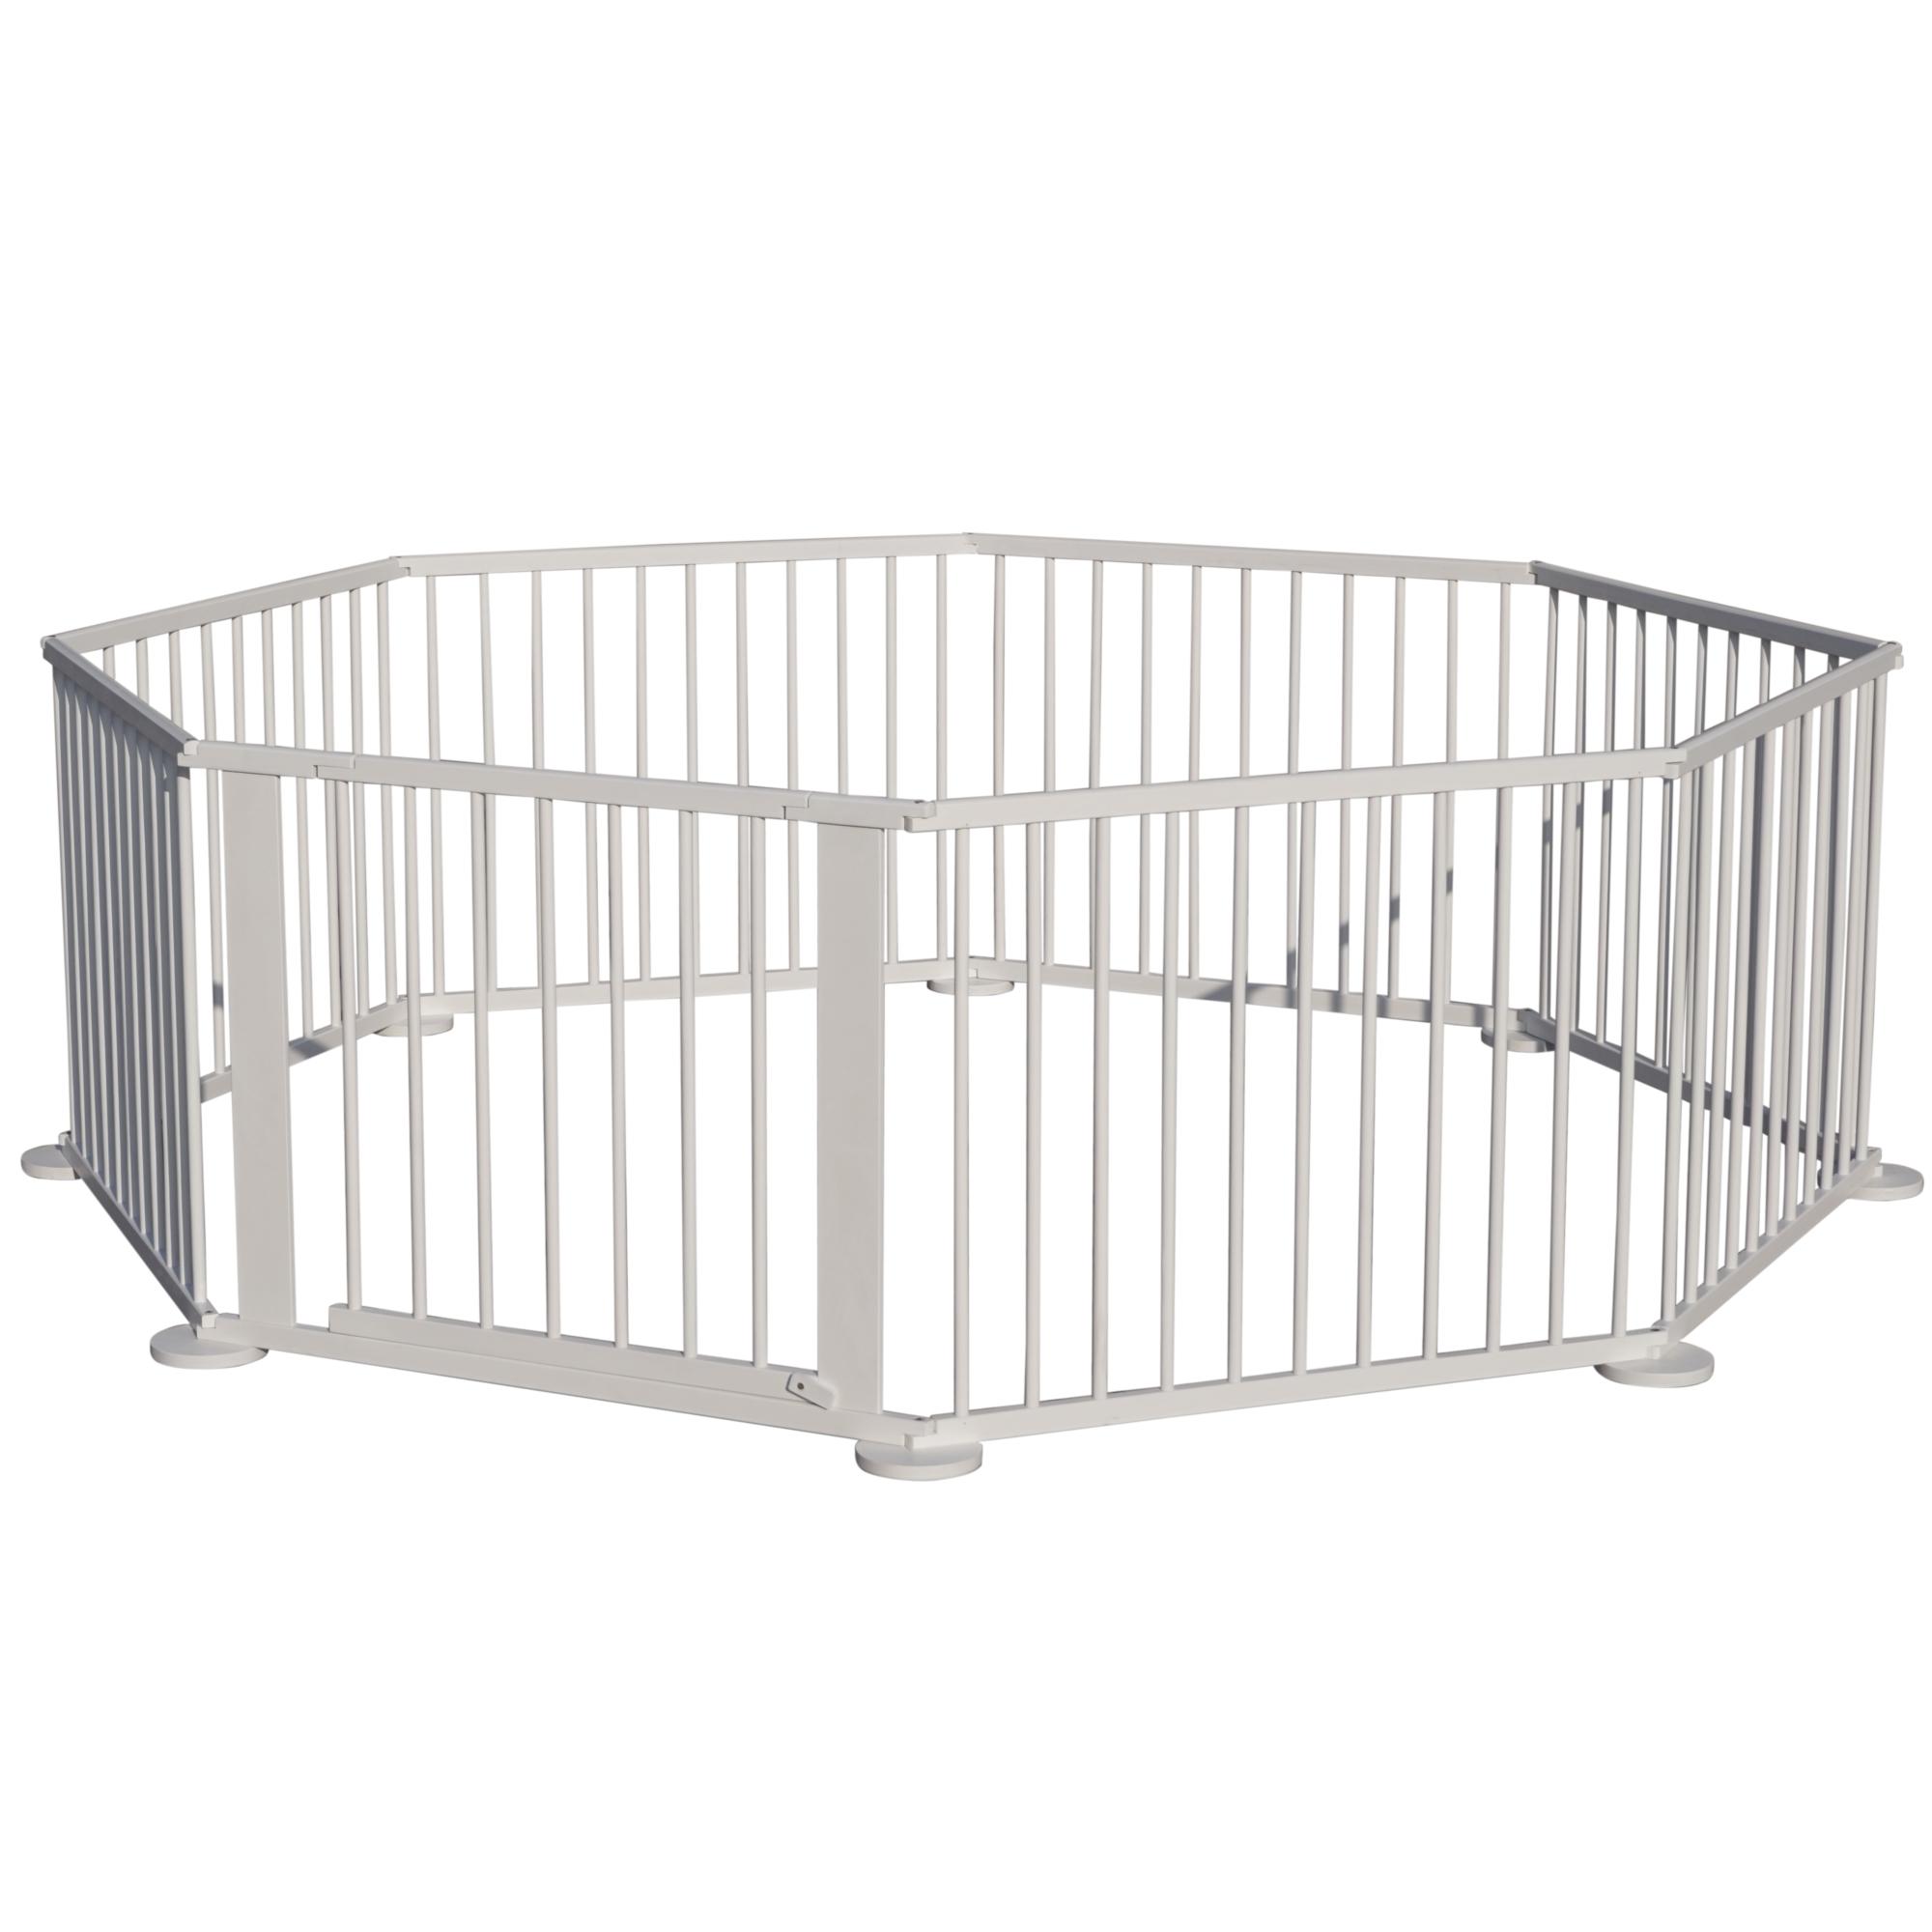 xxl baby laufgitter wei lasiert absperrgitter flexibler laufstall 8 eck 4260424135665 ebay. Black Bedroom Furniture Sets. Home Design Ideas